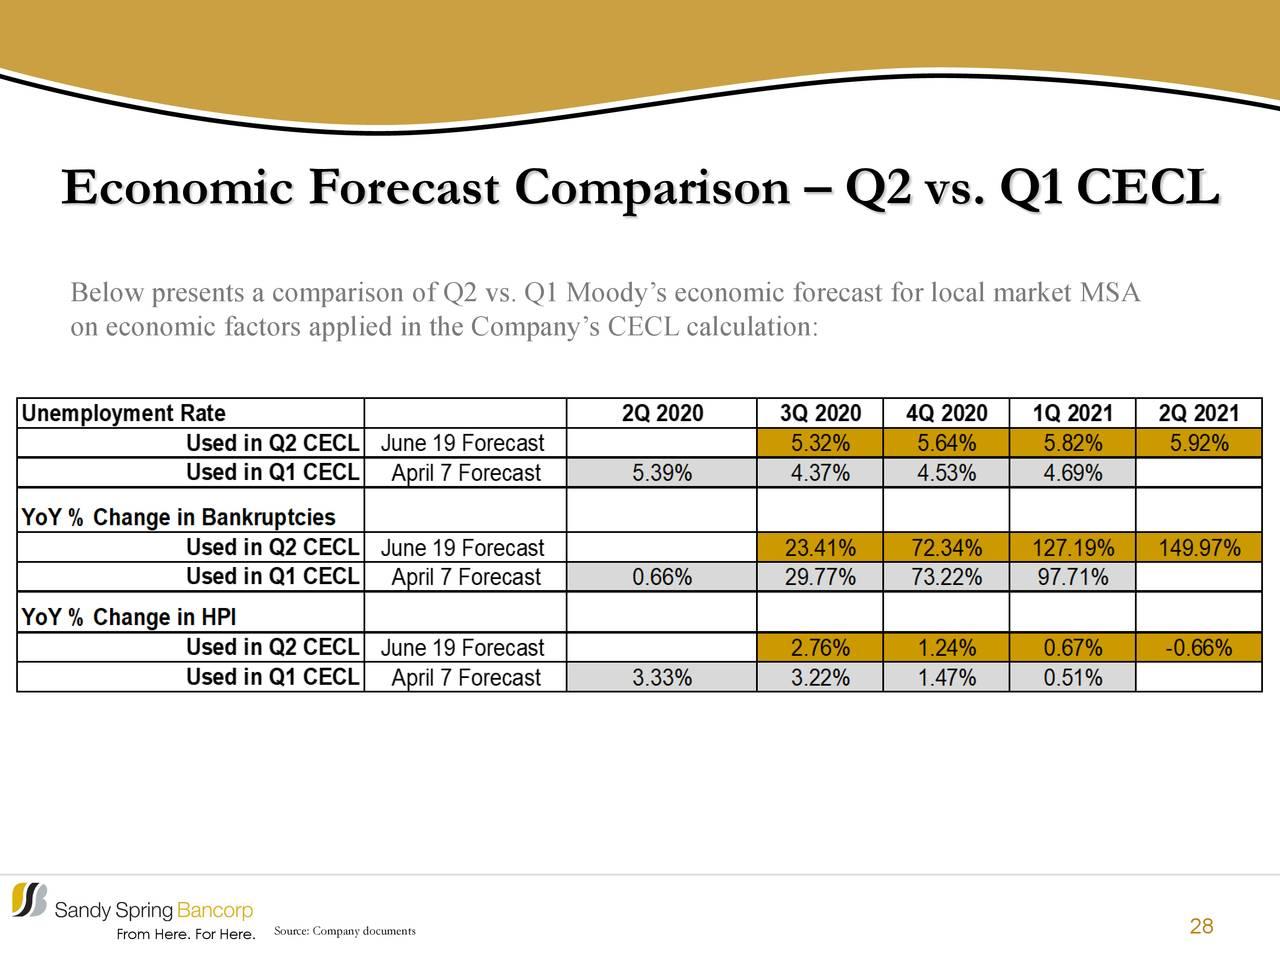 Comparación de pronóstico económico - Q2 vs. Q1 CECL